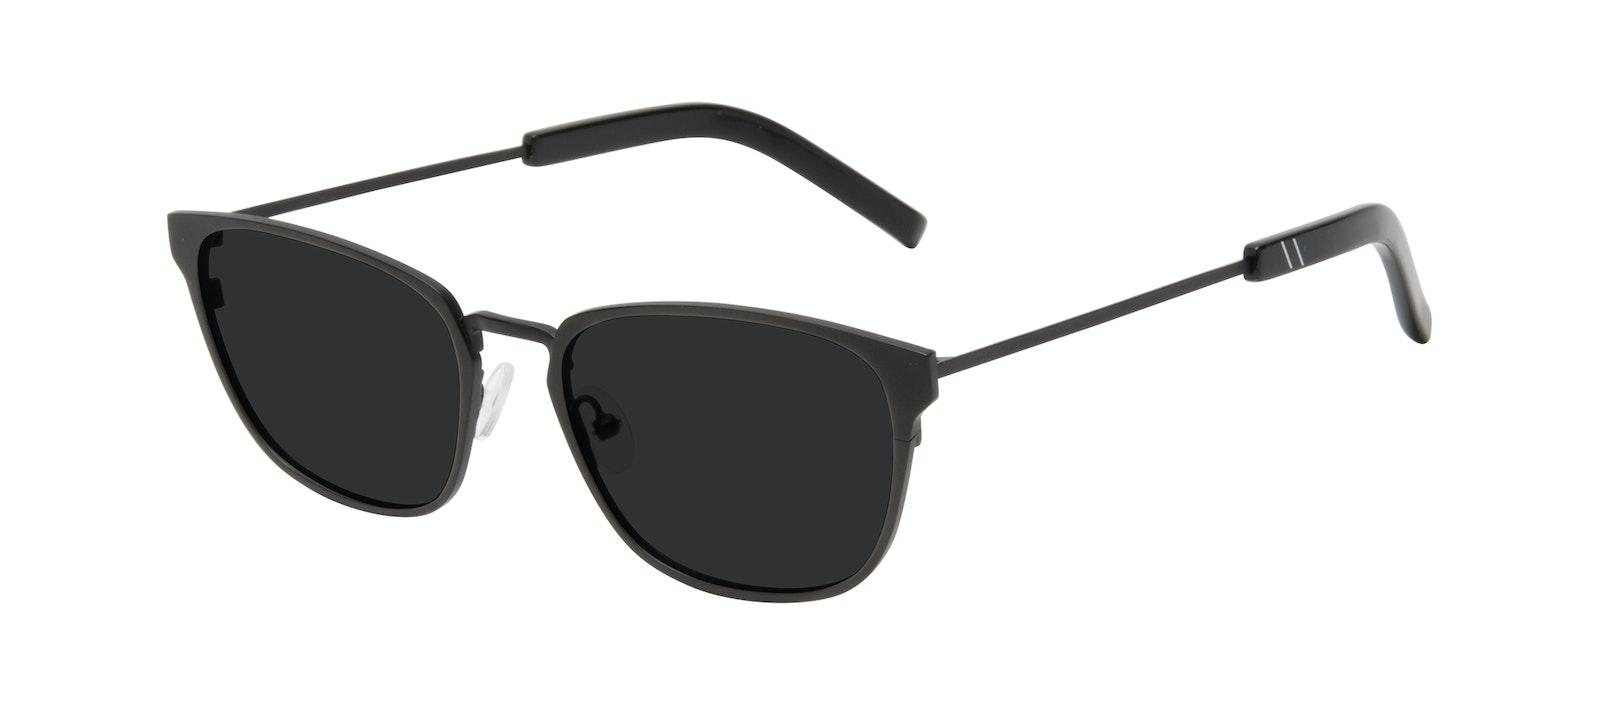 Affordable Fashion Glasses Square Sunglasses Men Flex Onyx Matte Tilt